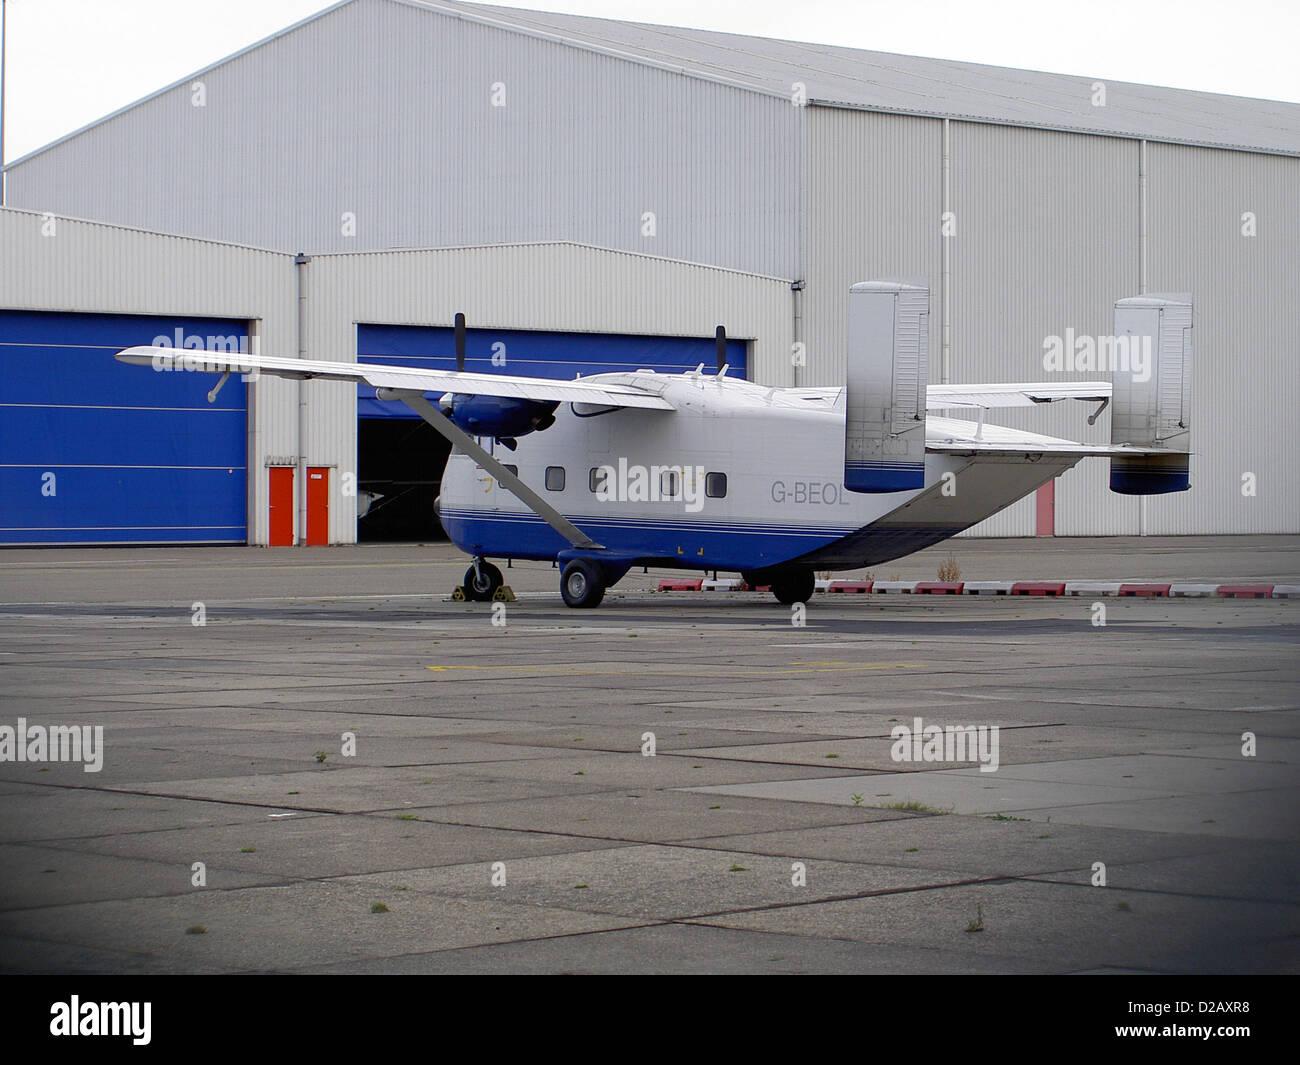 Shorts SC.7 Skyvan, G-BEOL. - Stock Image